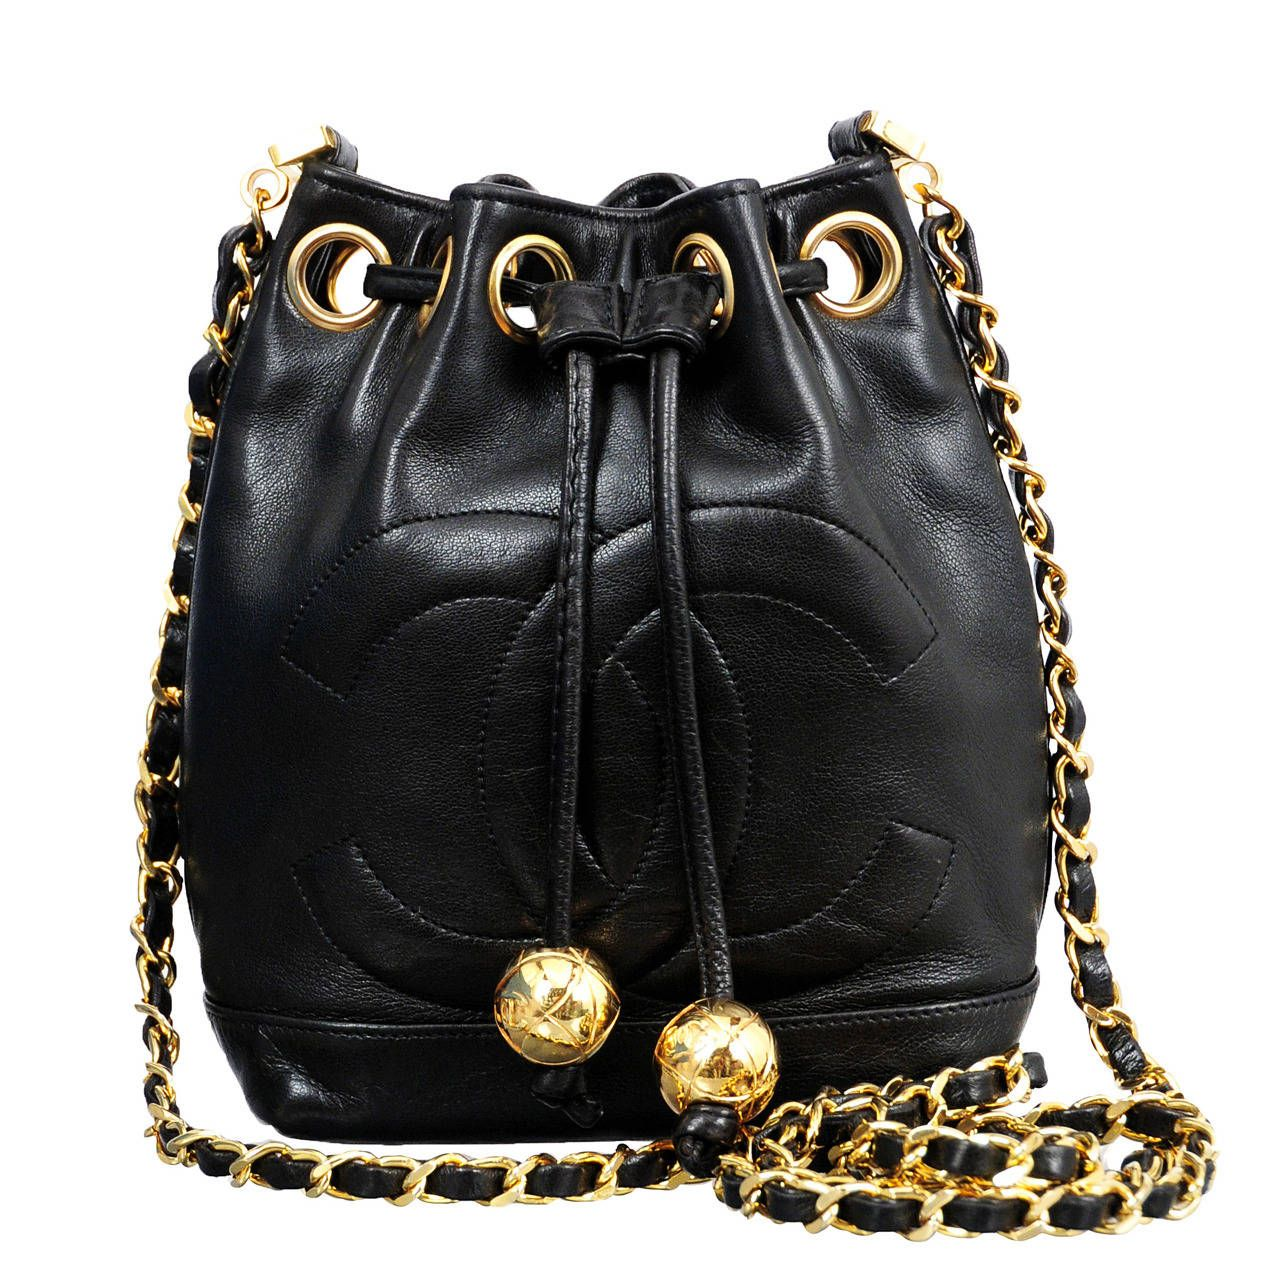 Chanel Black Lambskin Mini Bucket Bag 1stdibs Com Mini Bucket Bags Bucket Bag Chanel Black